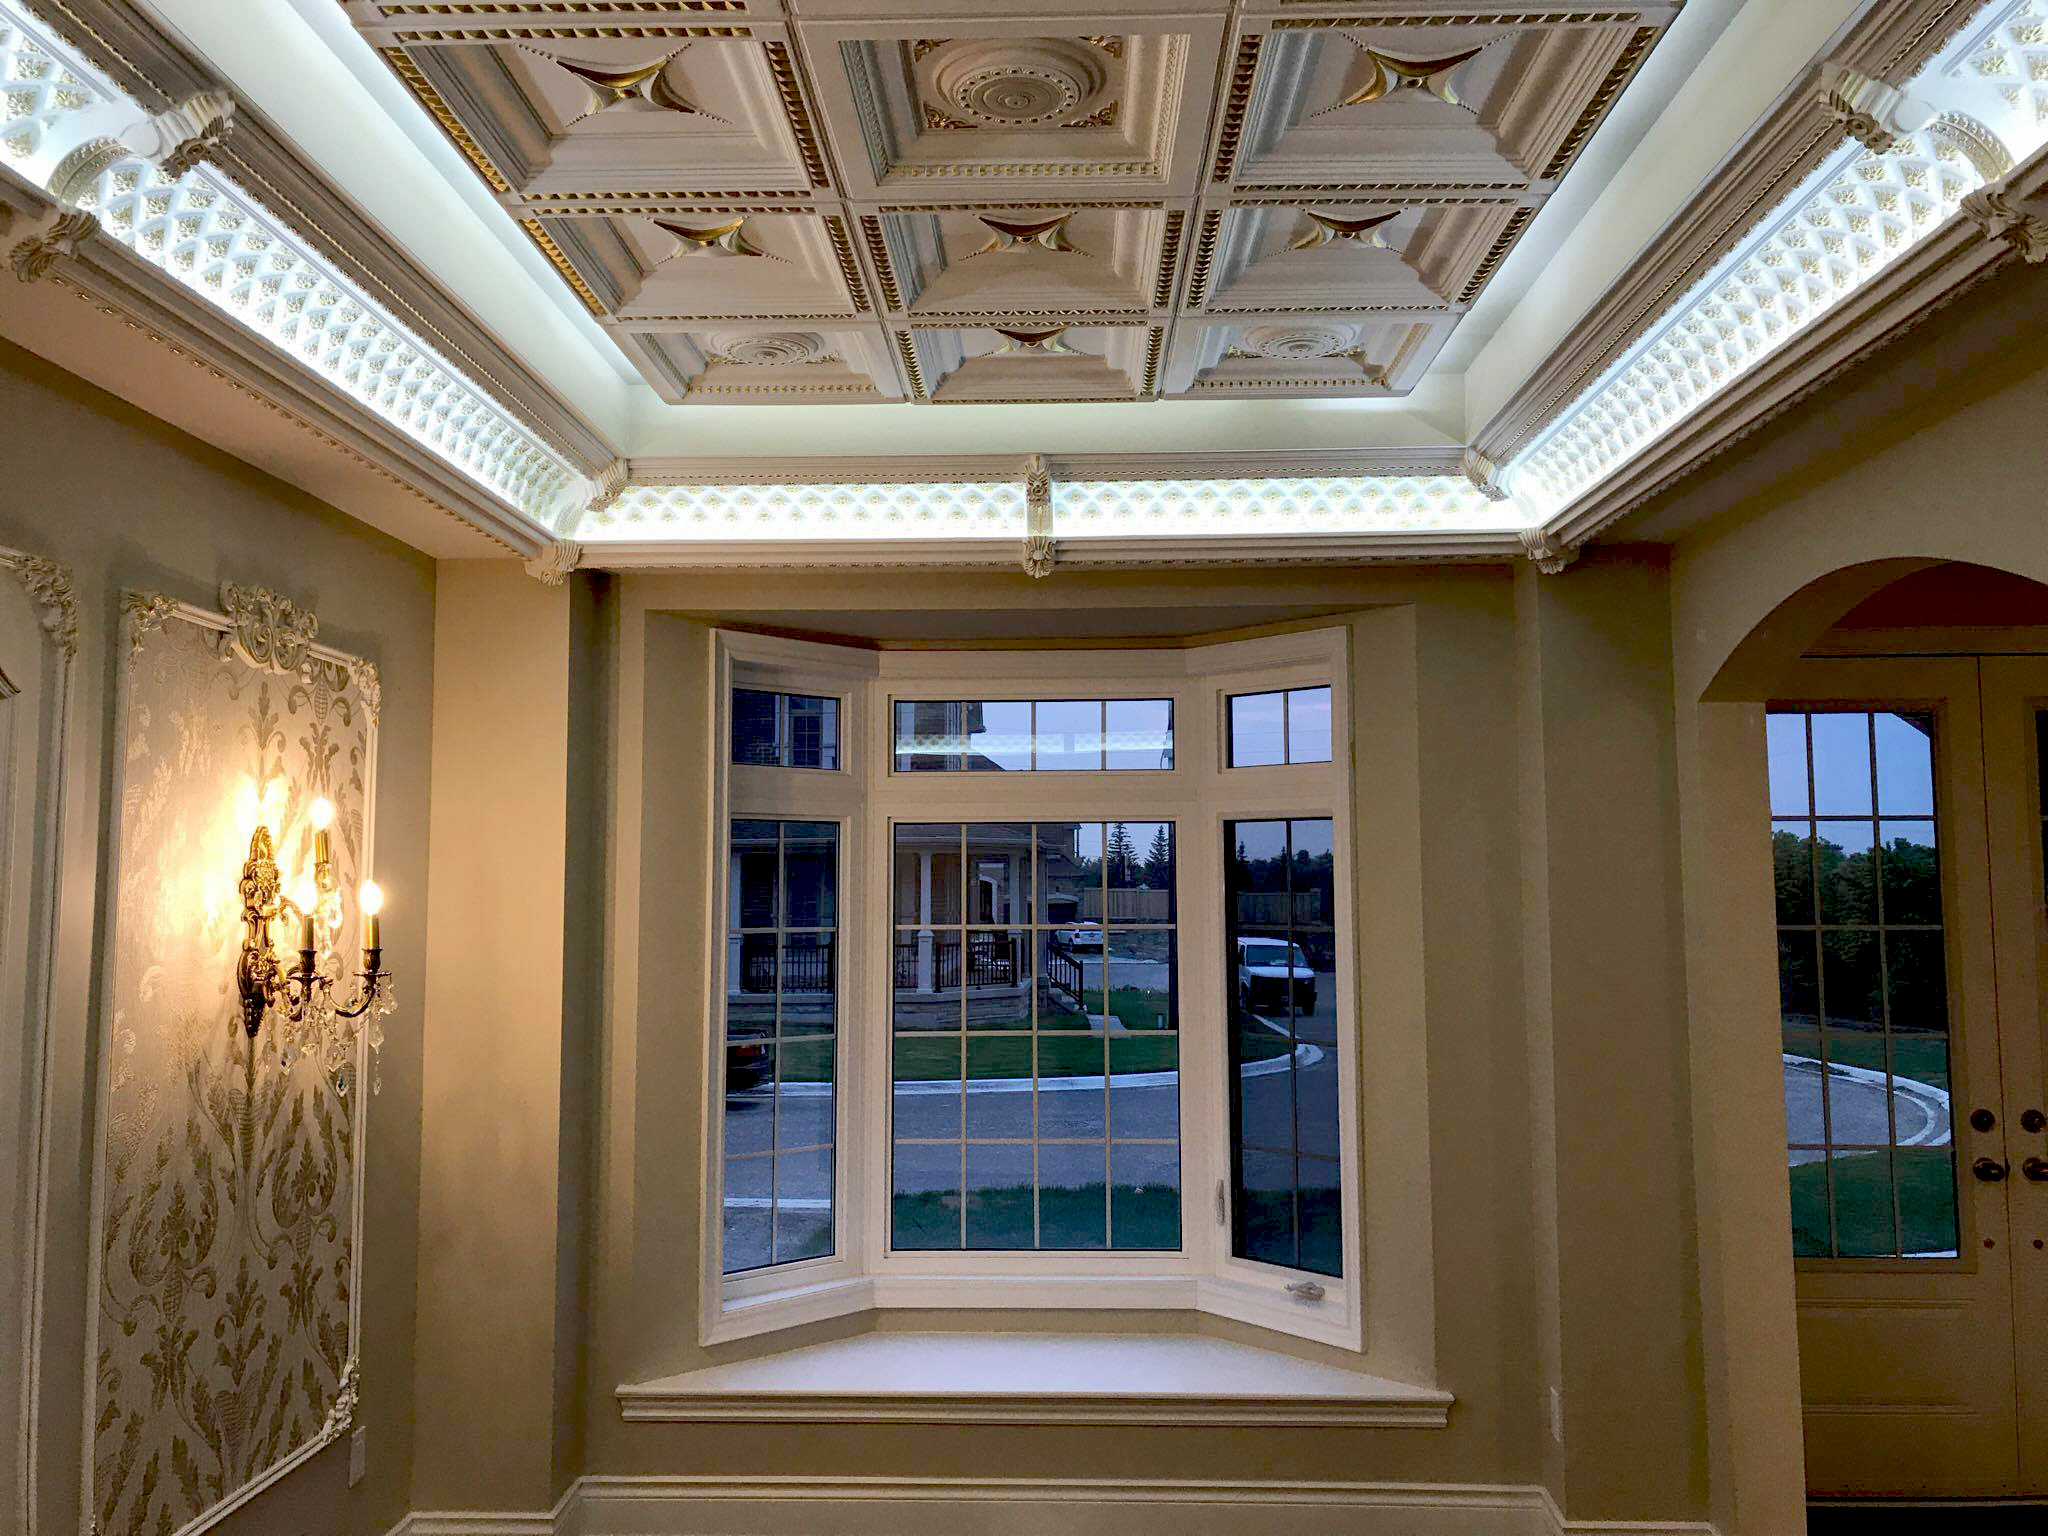 ceiling design kleinburg